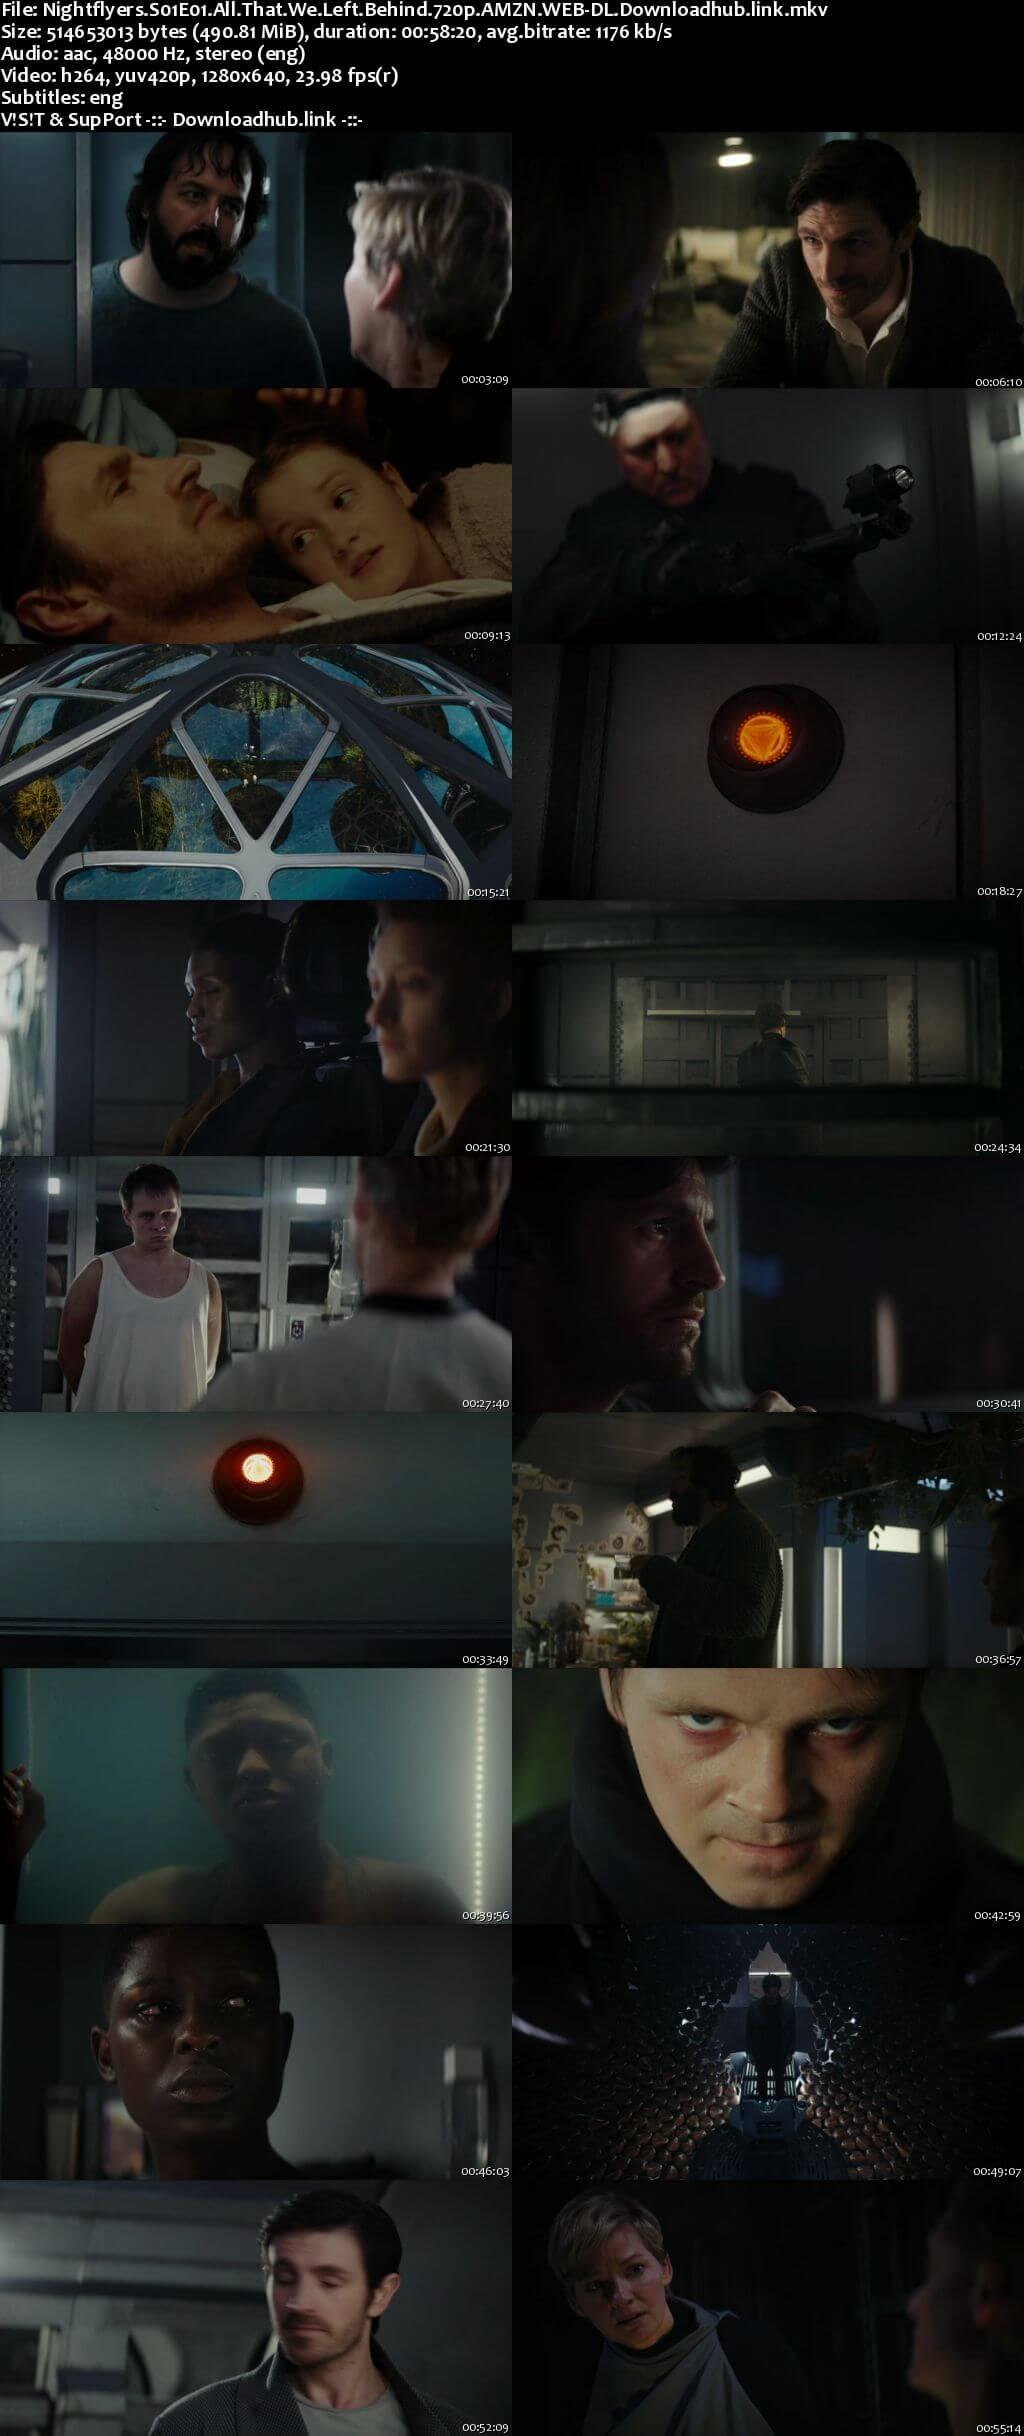 Nightflyers S01E01 500MB AMZN WEB-DL 720p ESubs